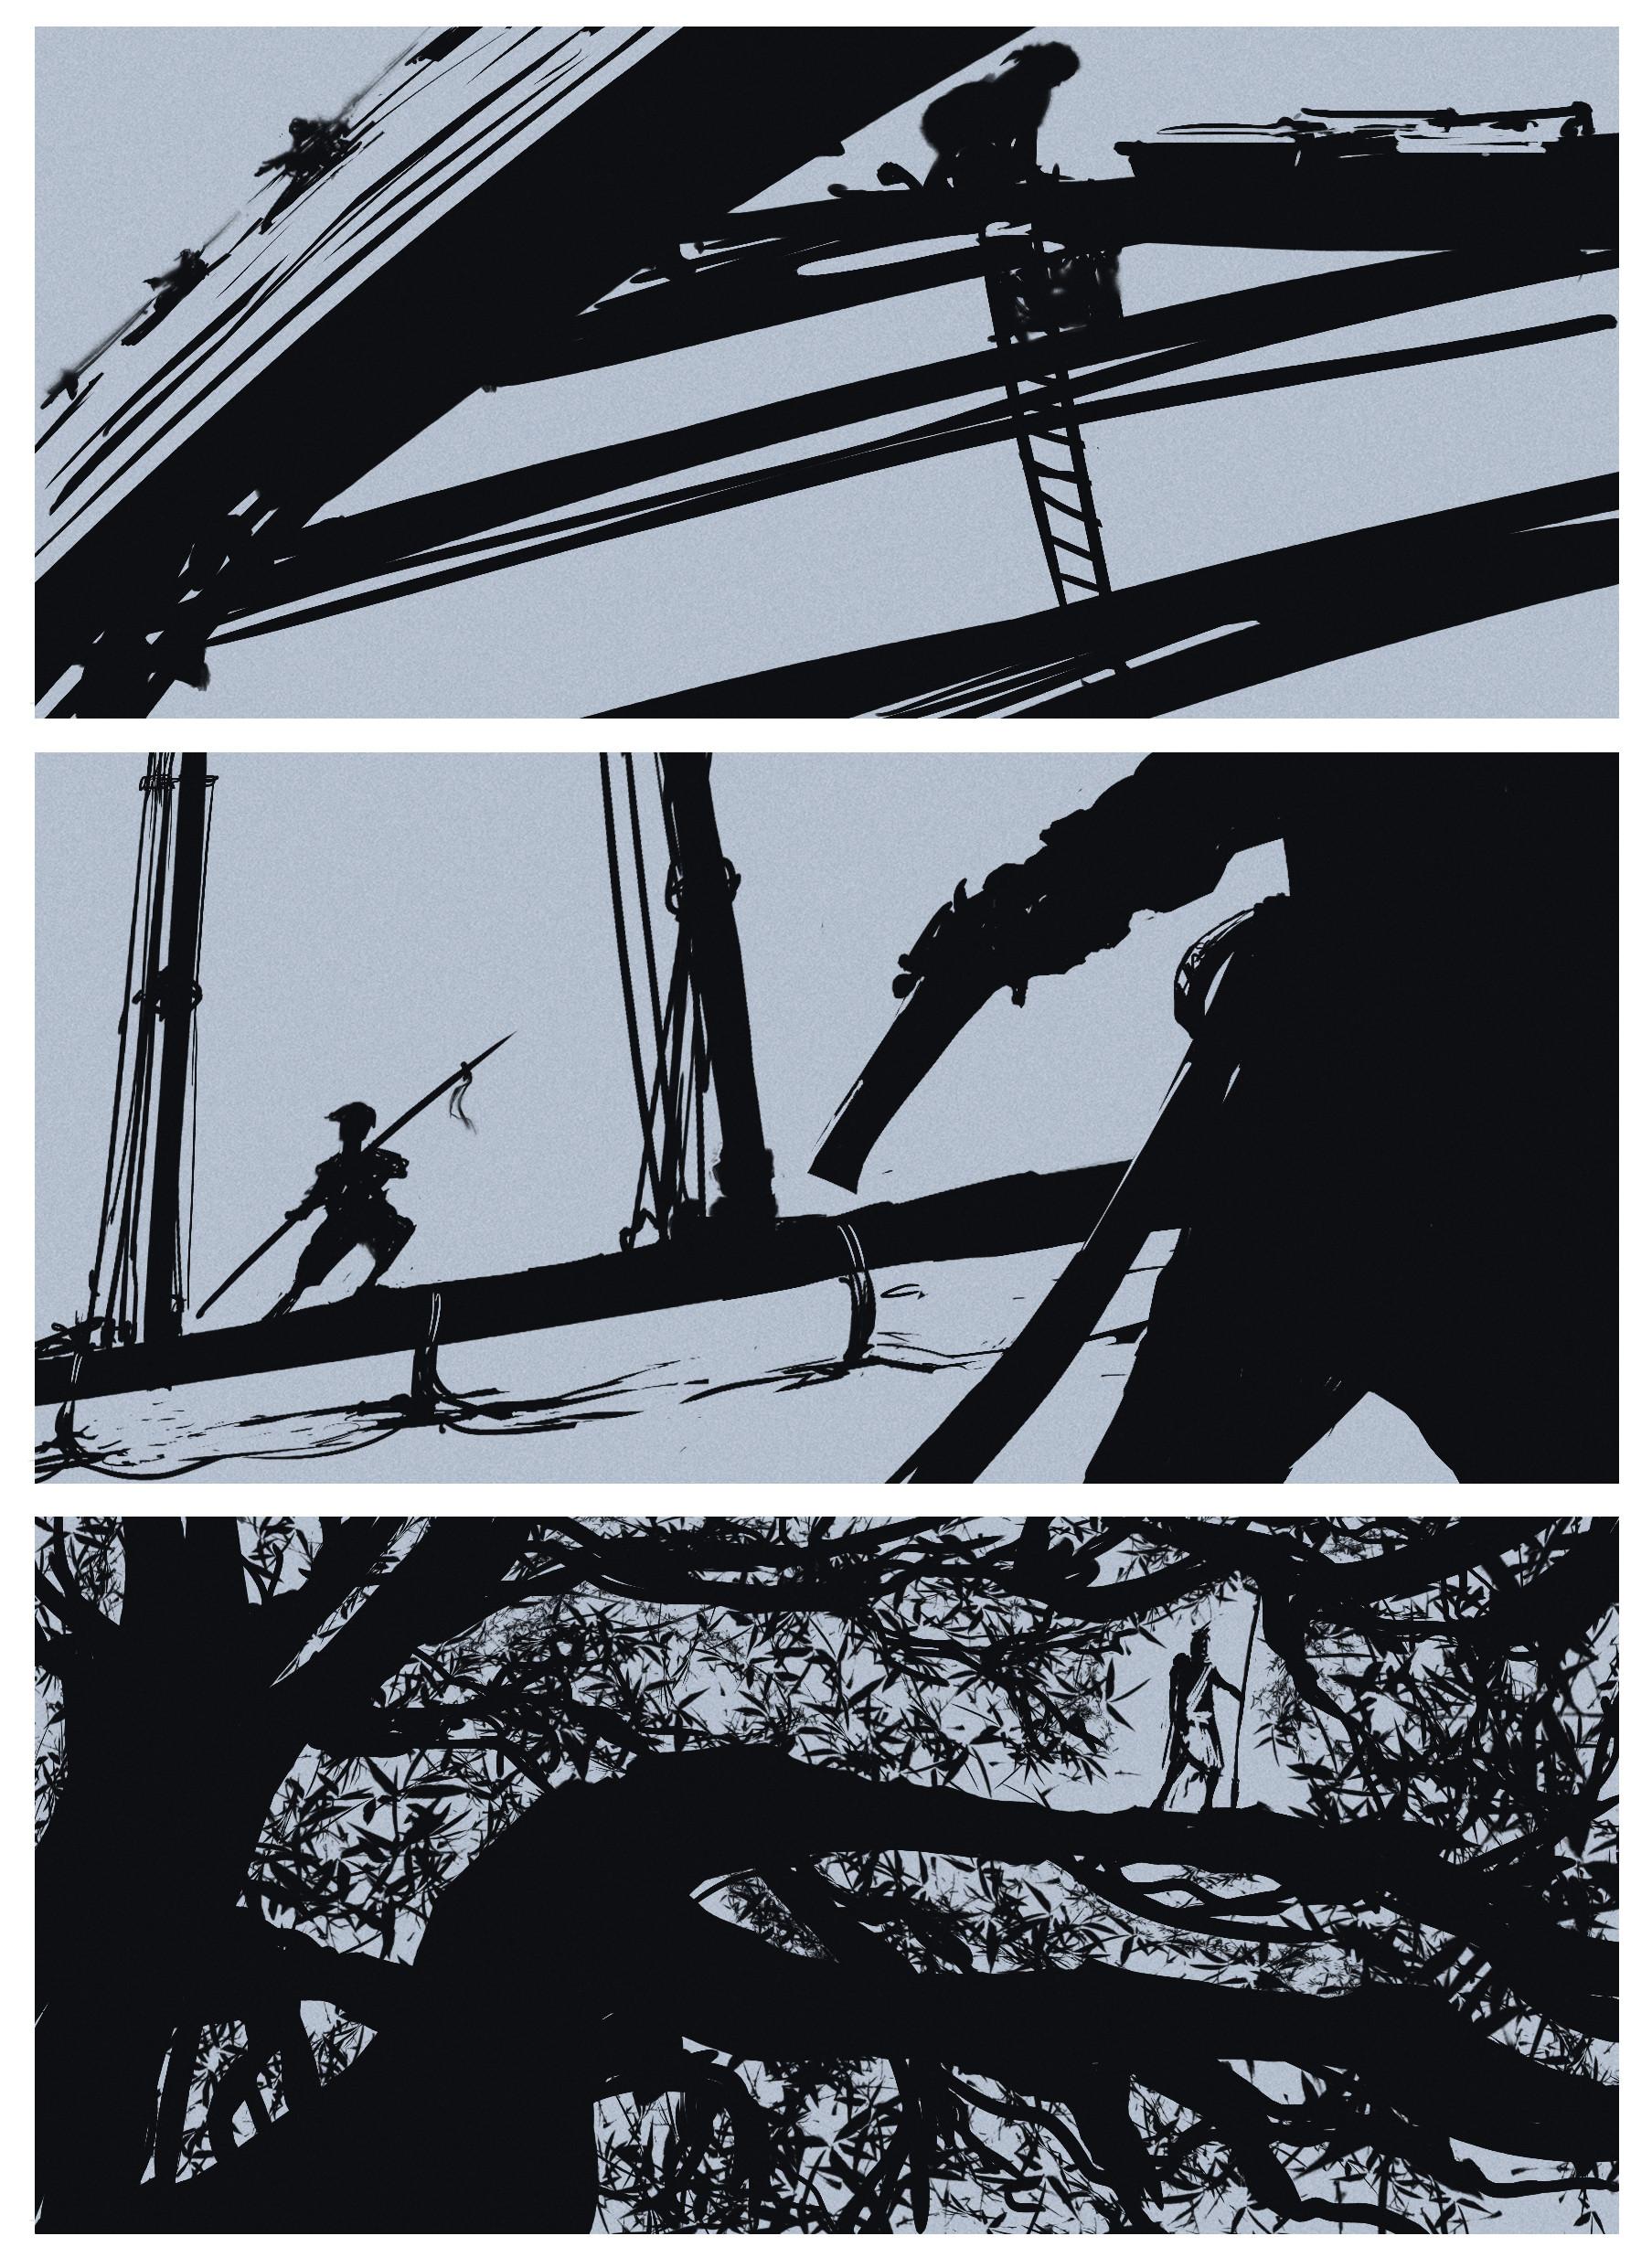 Sergio seabra 20170411 frame 3thmbs